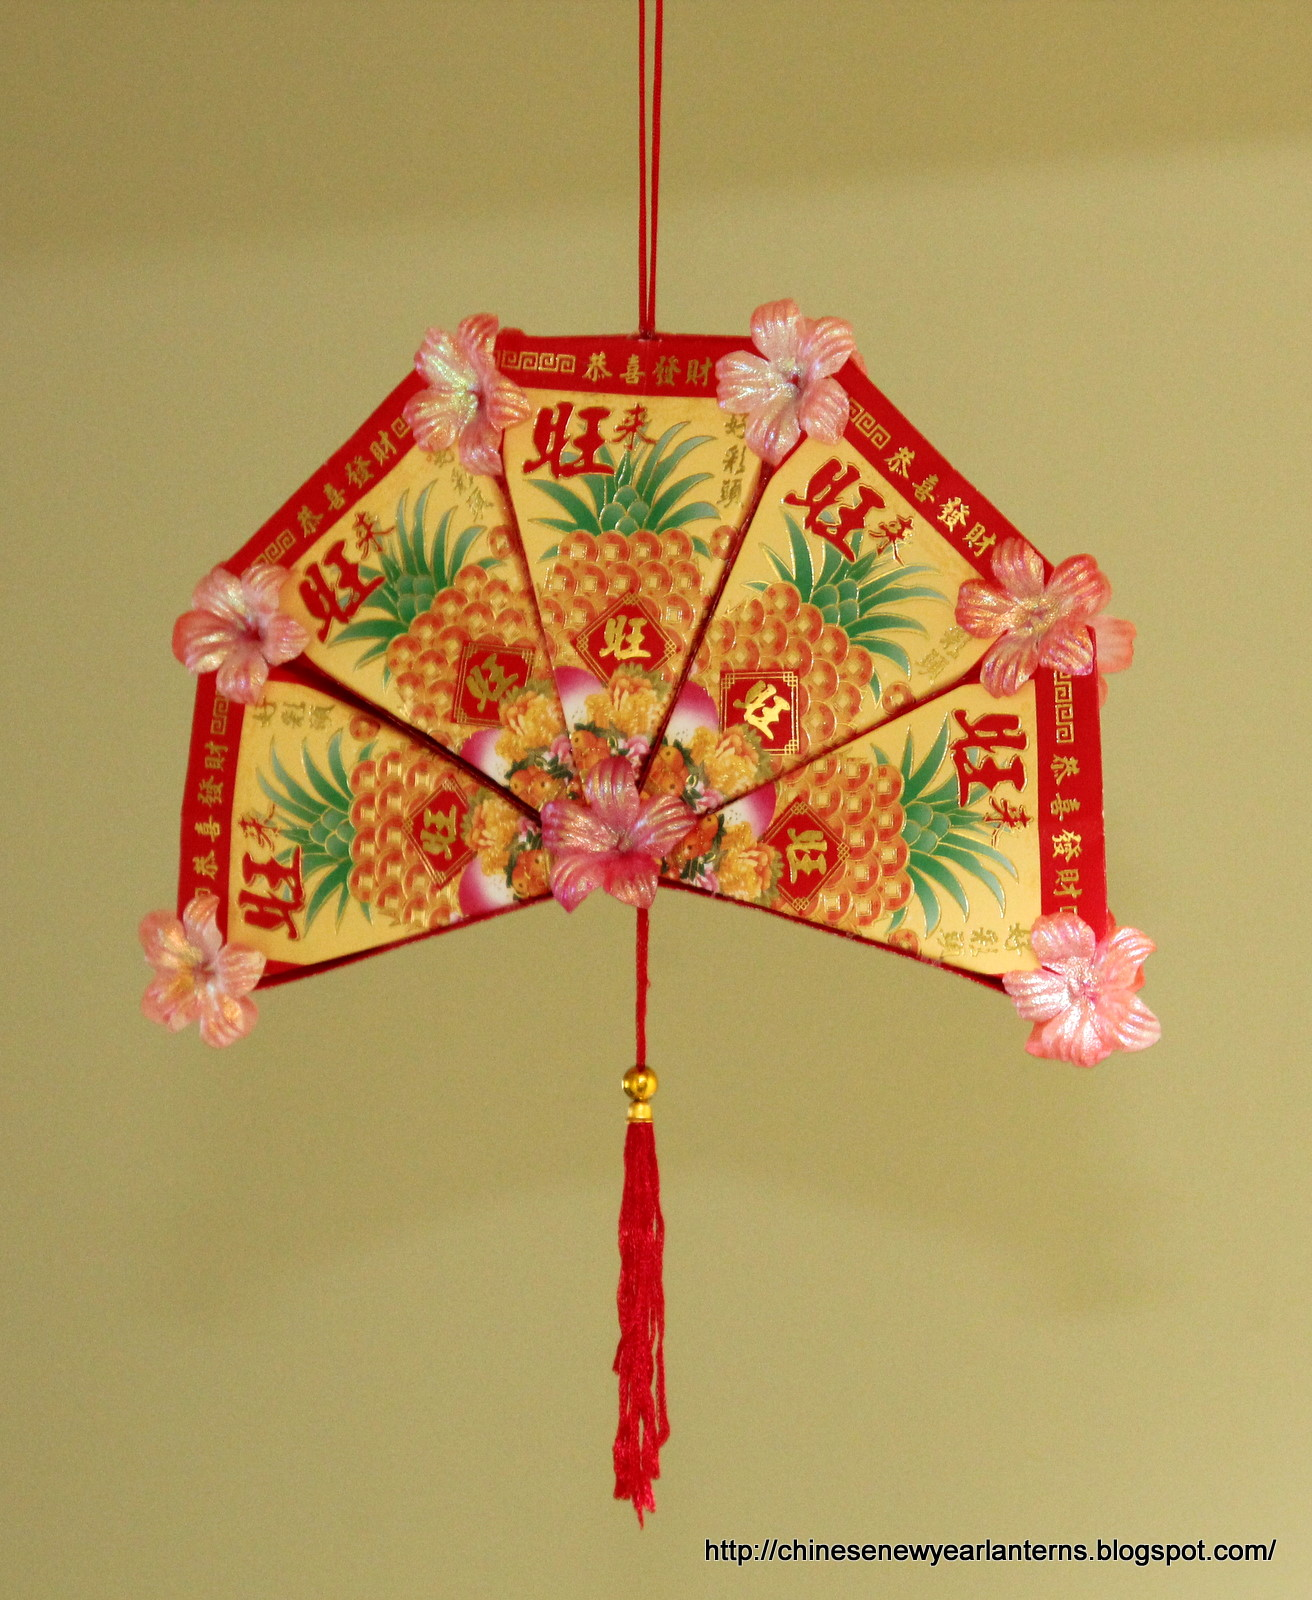 Chinese New Year Lanterns 红包灯笼手工制作: How to Make an Ang Pow Fan